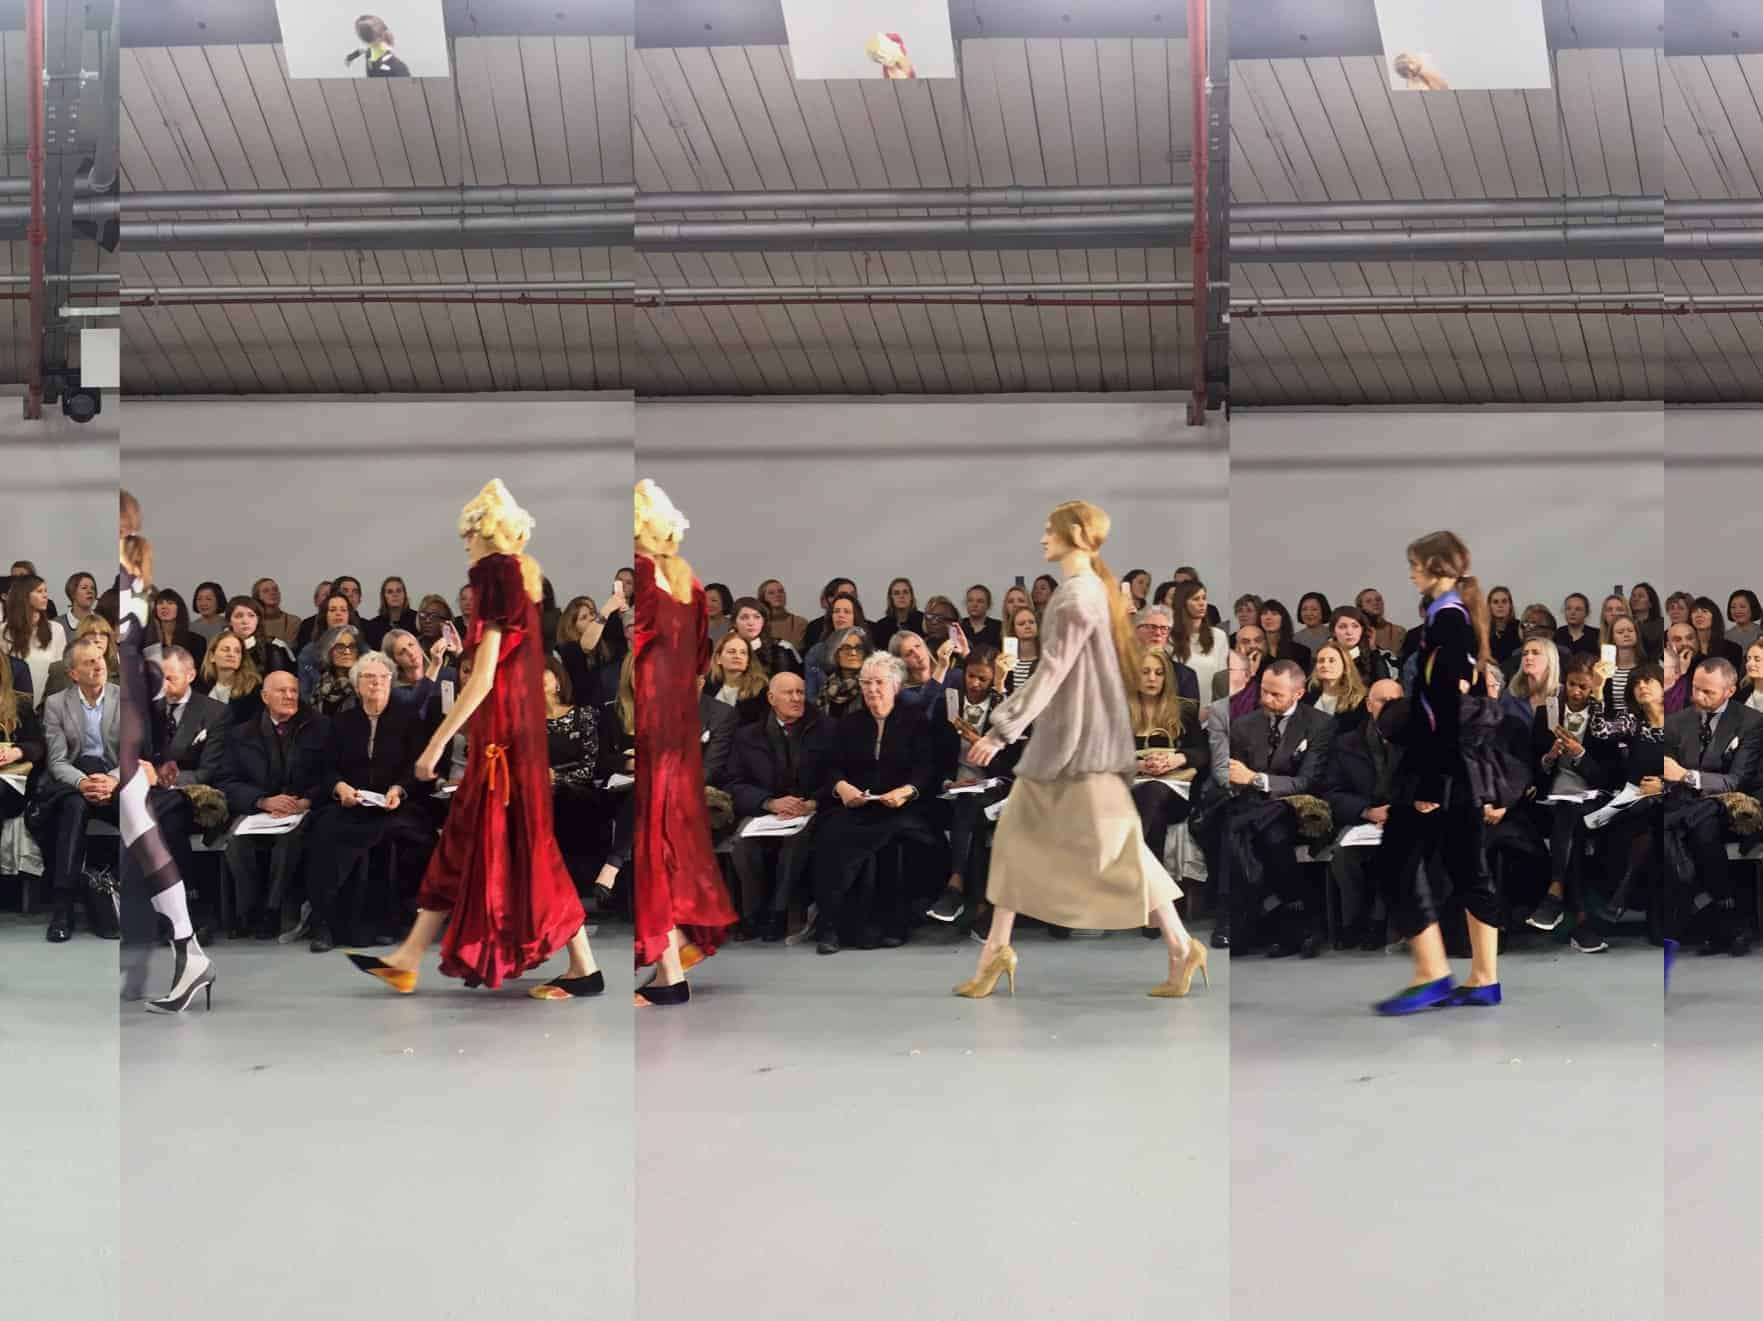 London Fashion Week: Central Saint Martins MA 2016 Show